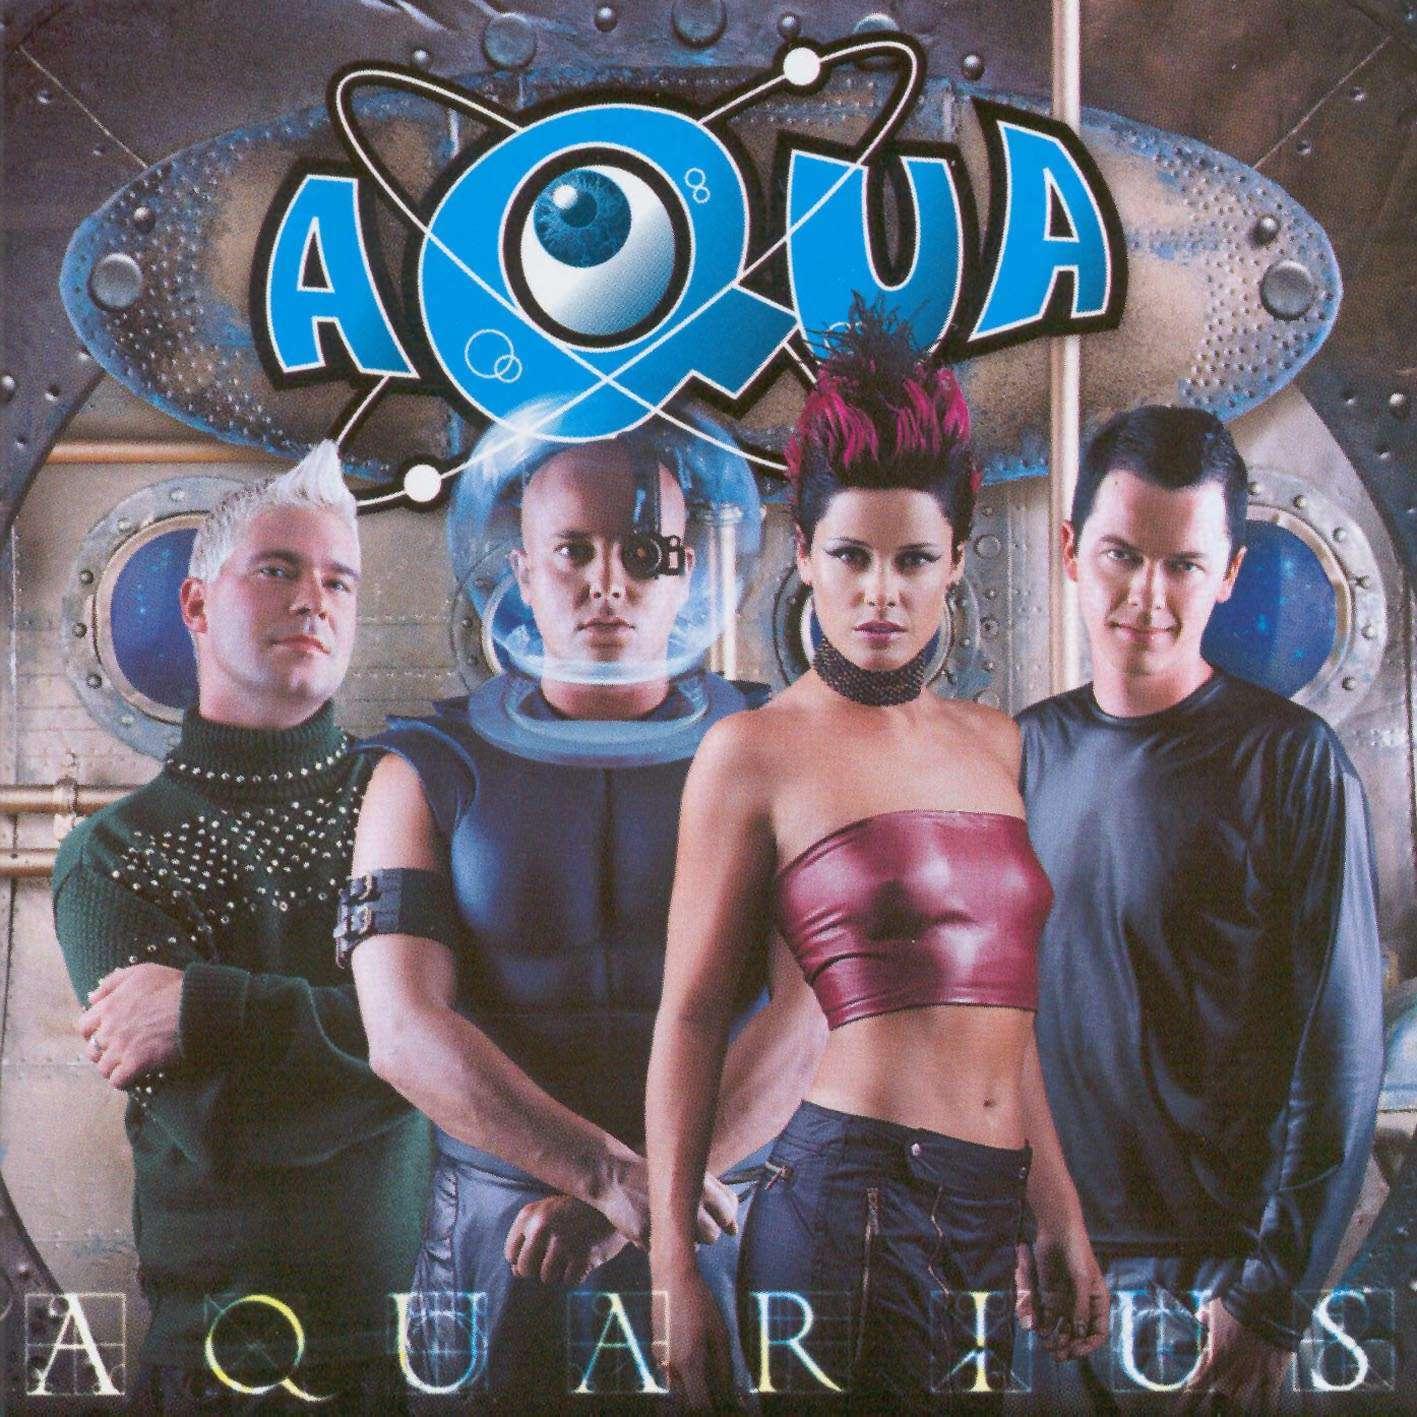 http://1.bp.blogspot.com/-uGWag5hLa20/TrzS2q9wdvI/AAAAAAAACKI/sraslOB3PNE/s1600/Aqua-Aquarius-Delantera.jpg